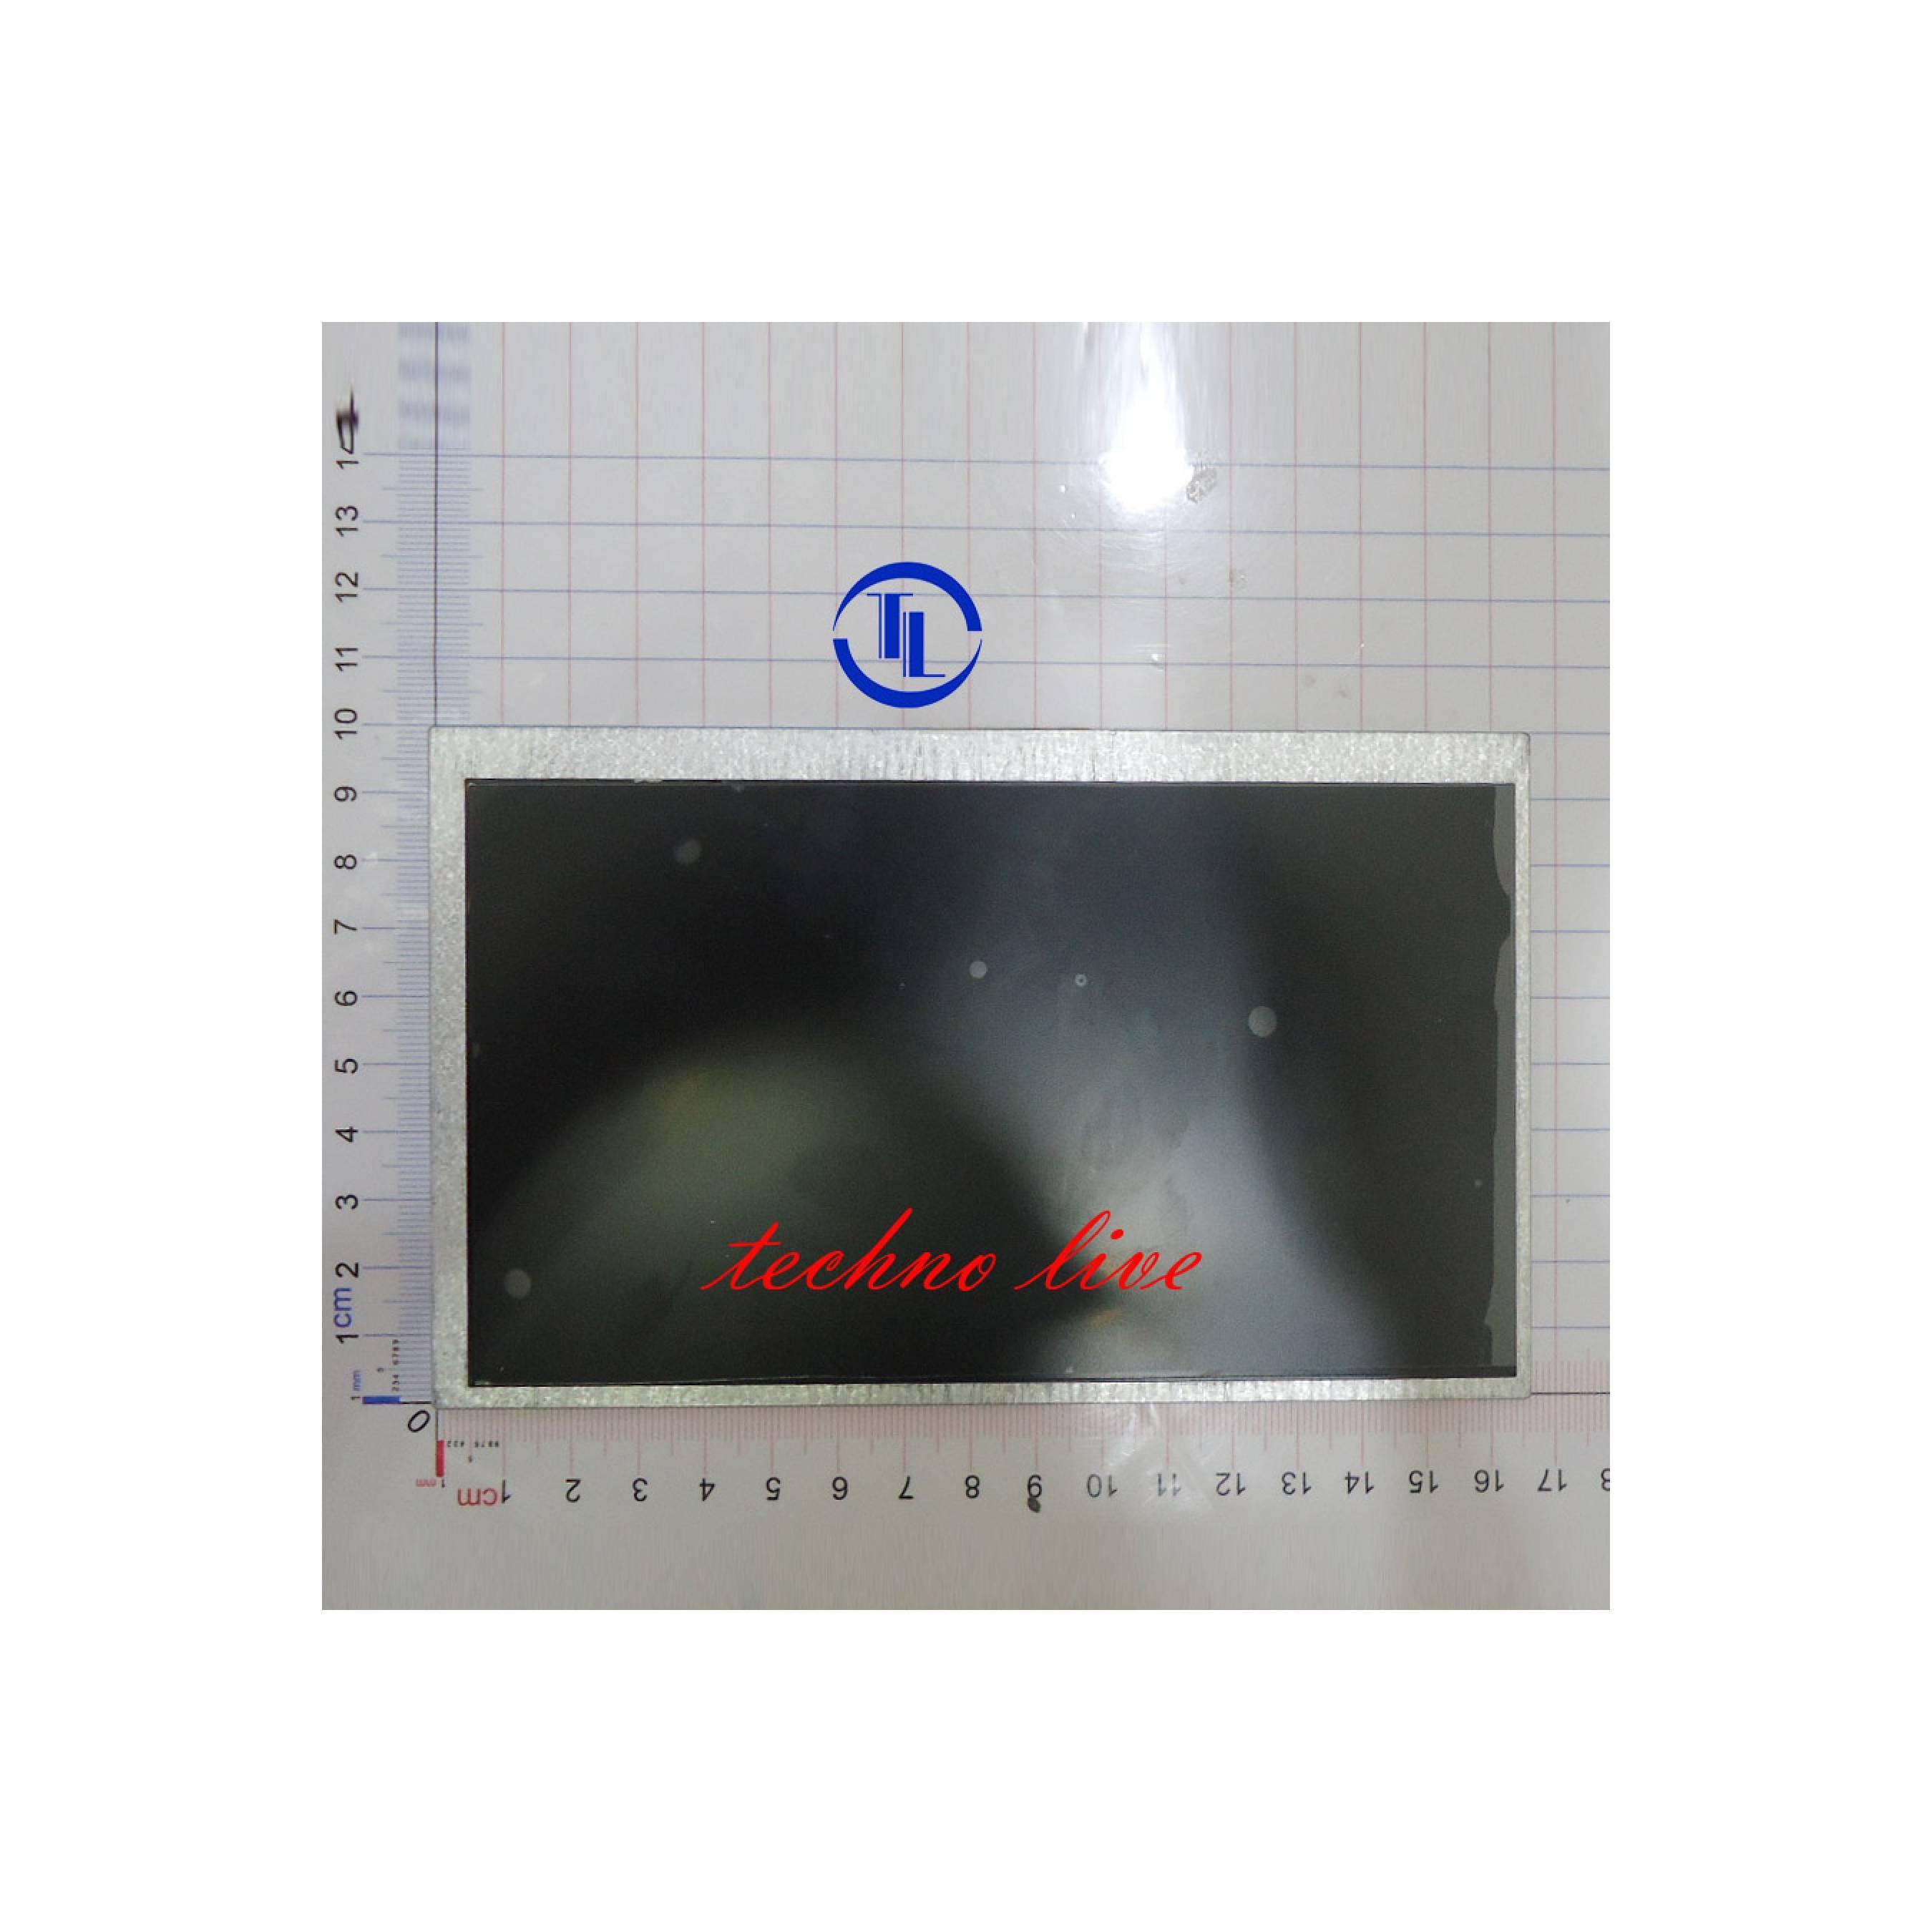 LCD ADVAN T2E / T2F / T2G / E1B / T1C / T2C / T1F / MG-M1